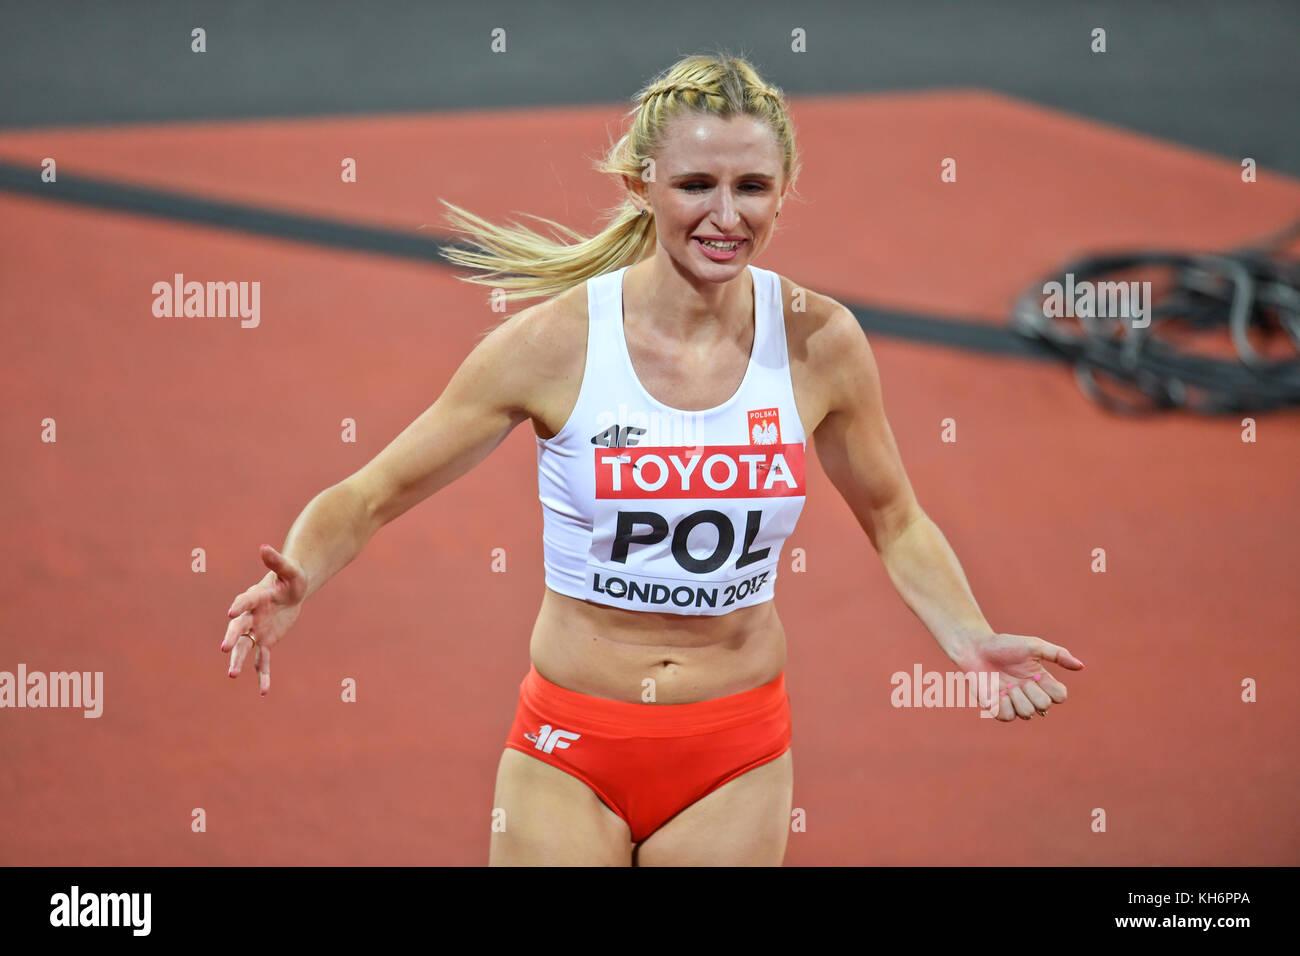 Malgorzata Holub (Poland) - 4x400 Metres Relay women - IAAF World Championships - London 2017 - Stock Image